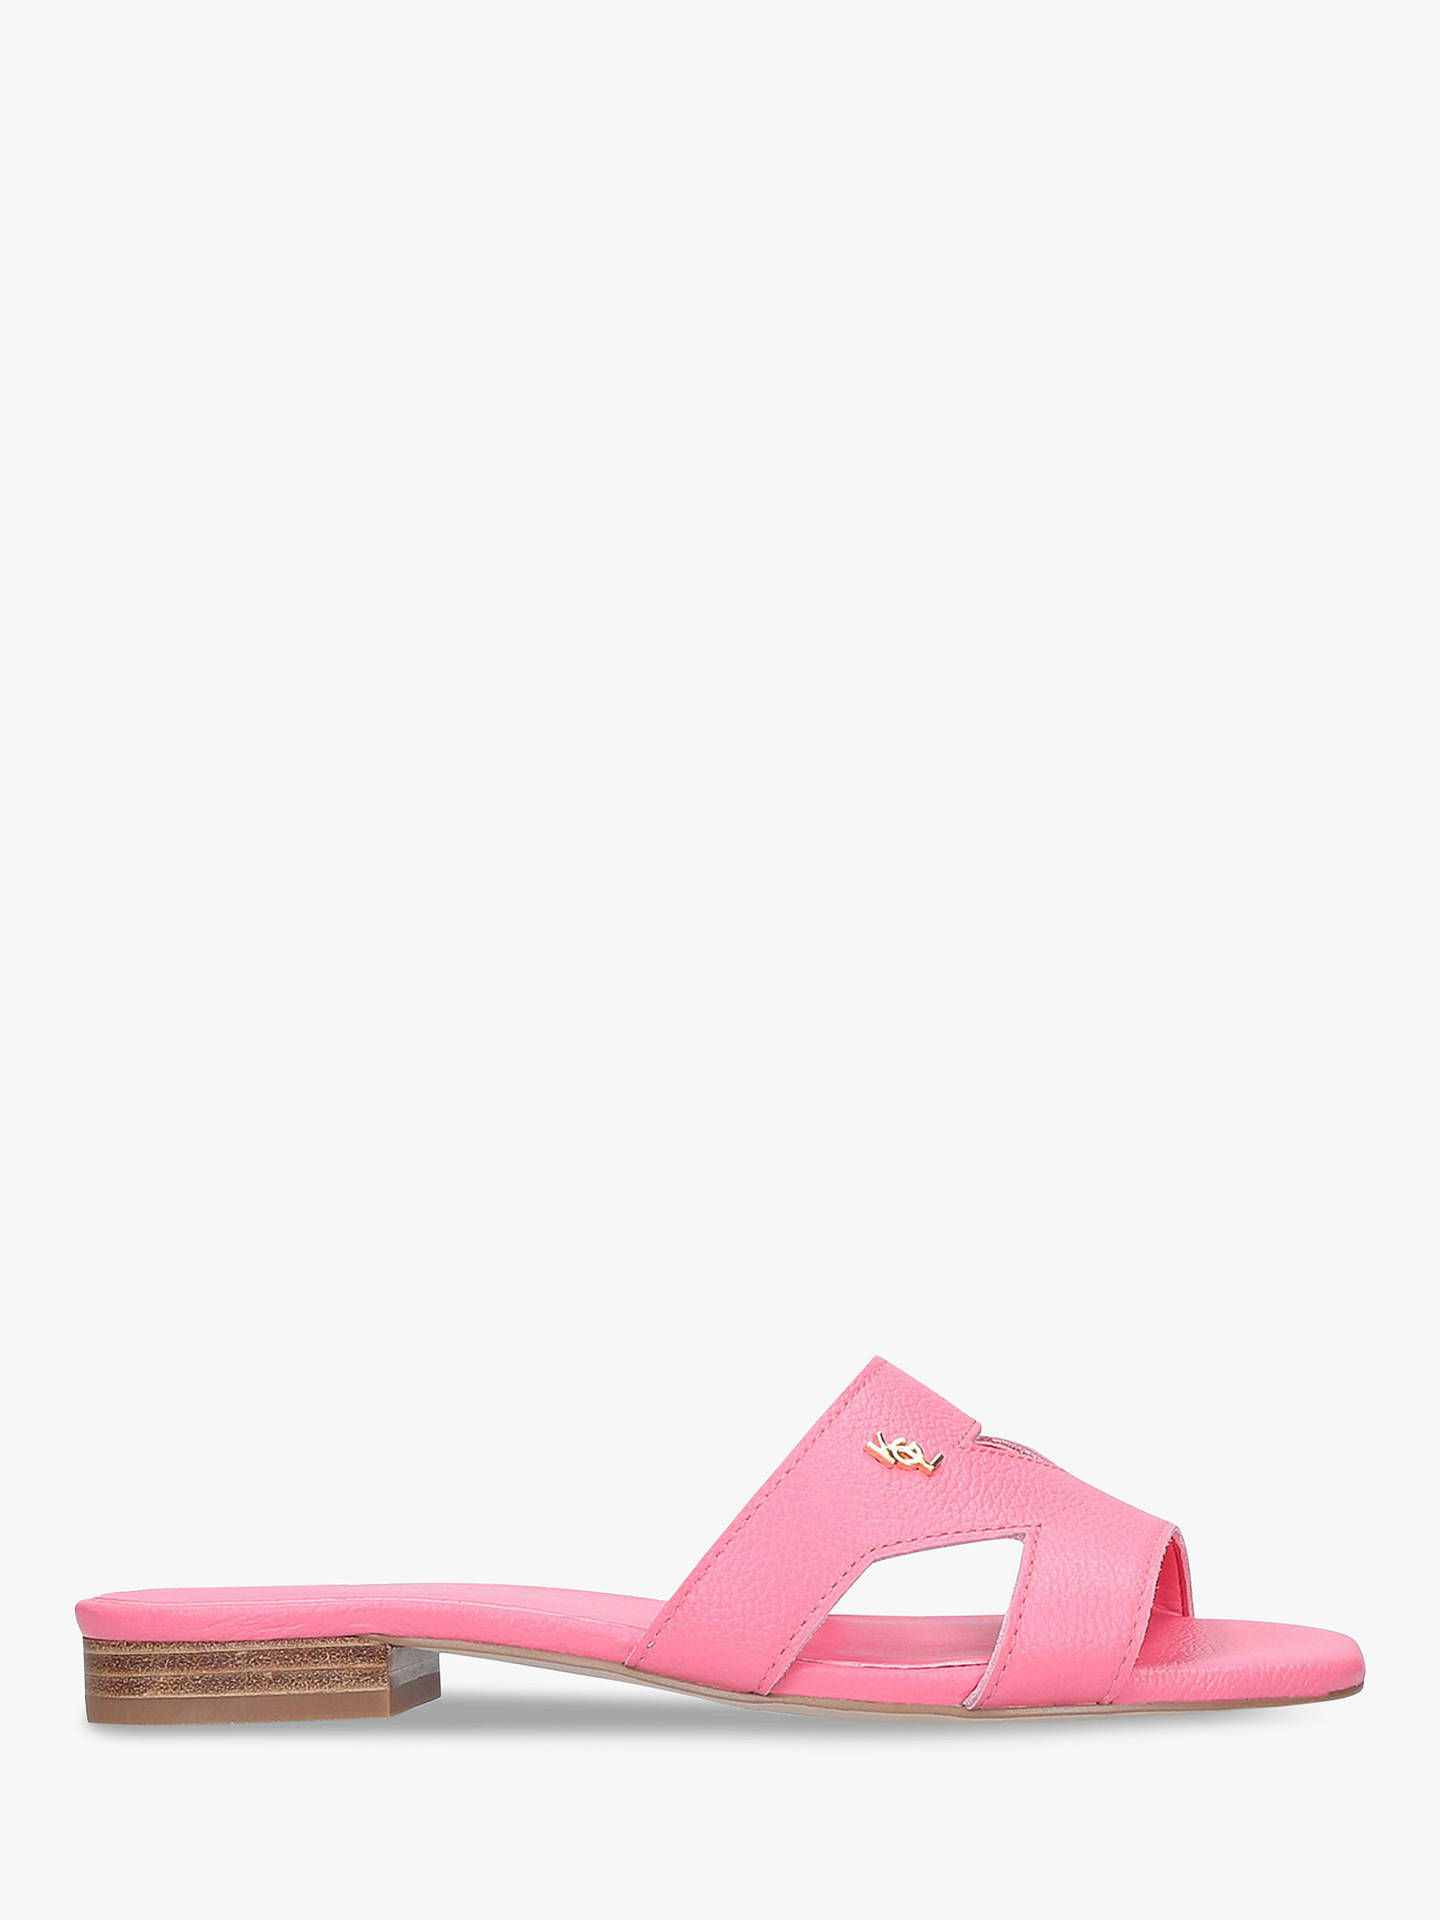 b4c388dcc18 Kurt Geiger London Odina Slip On Sandals, Mid Pink Leather